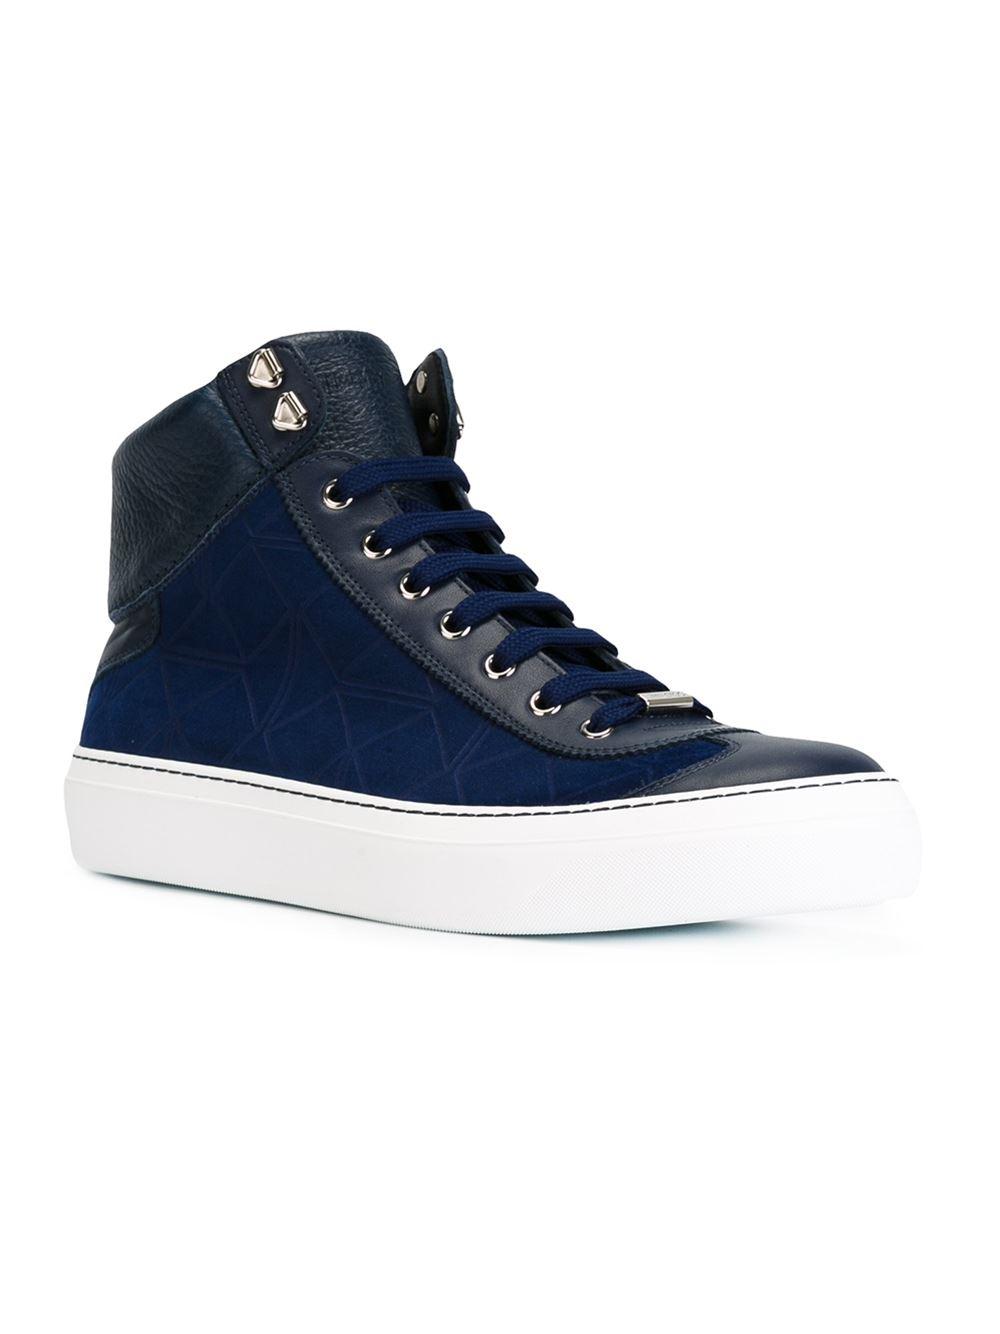 jimmy choo argyle high top sneakers in blue for men lyst. Black Bedroom Furniture Sets. Home Design Ideas